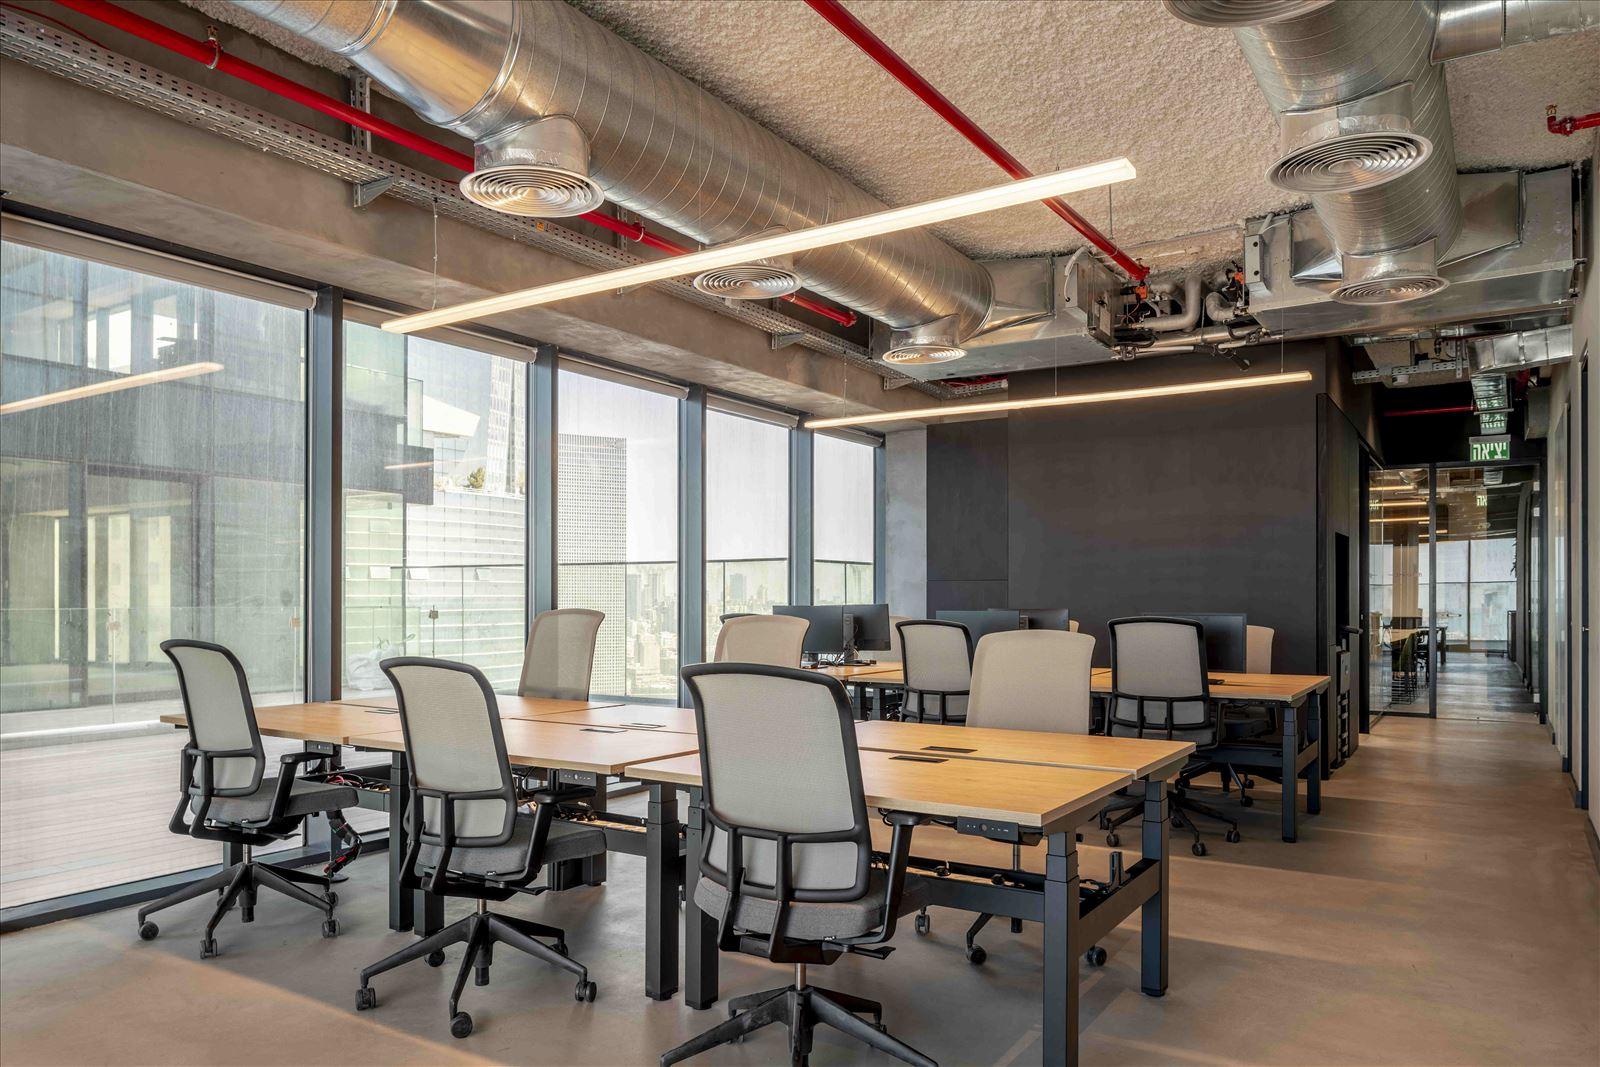 Office project תאורה בחלל העבודה במשרד על ידי קמחי תאורה